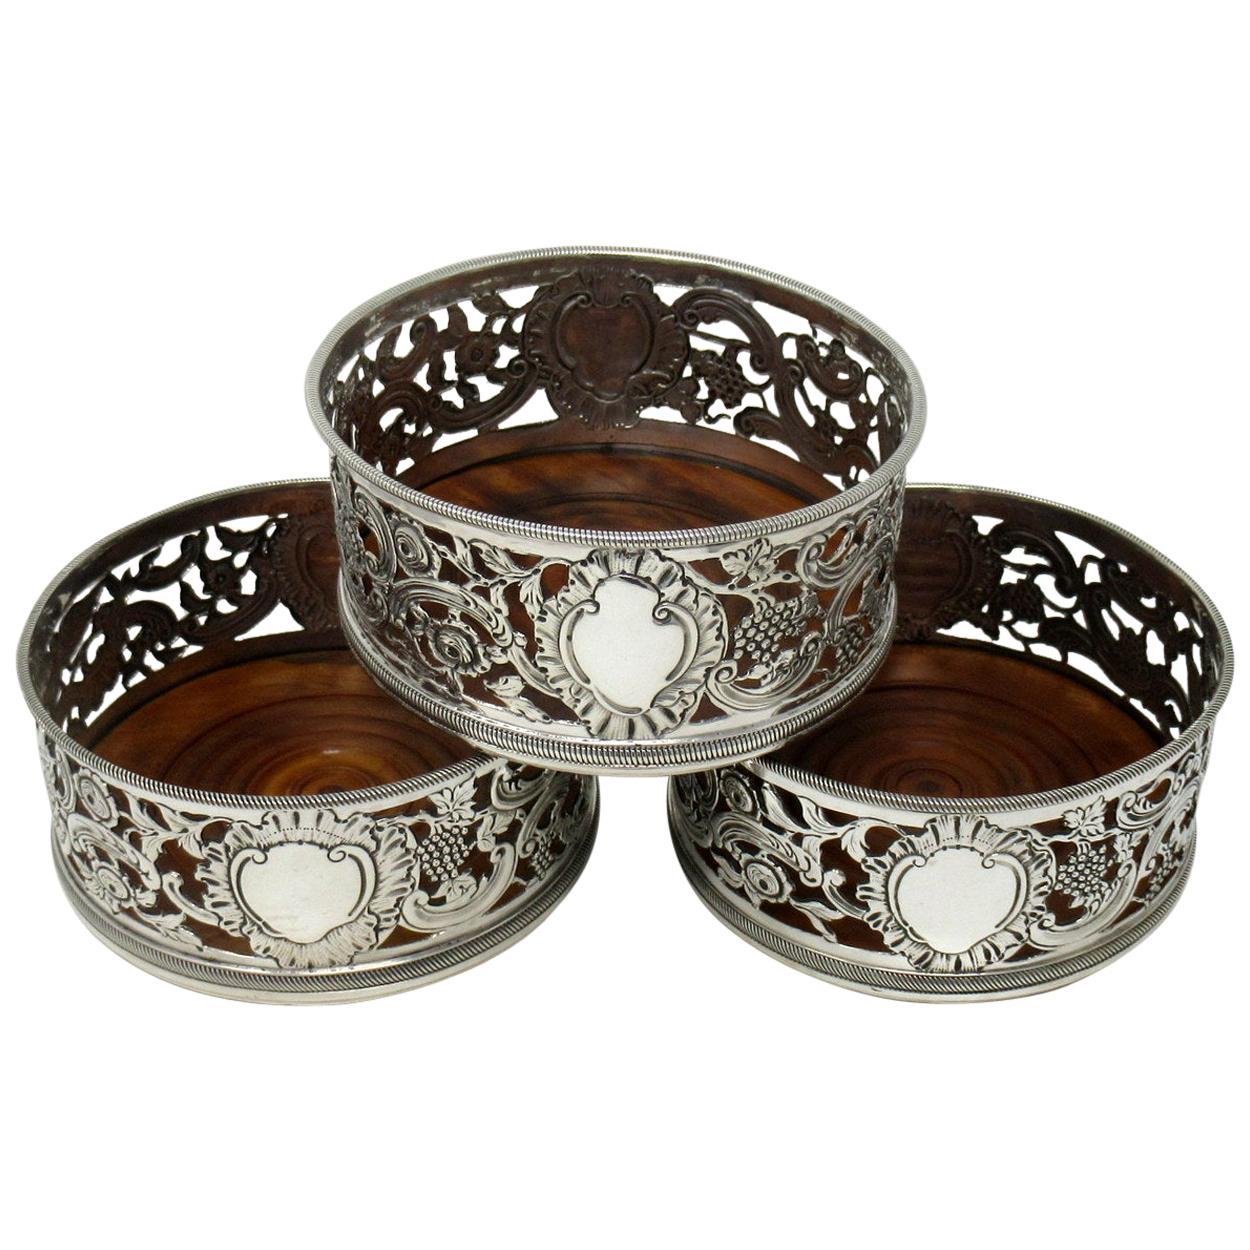 Set of Three Sterling Silver Wine Coasters Samuel Hayne Dudley Cater London 1841